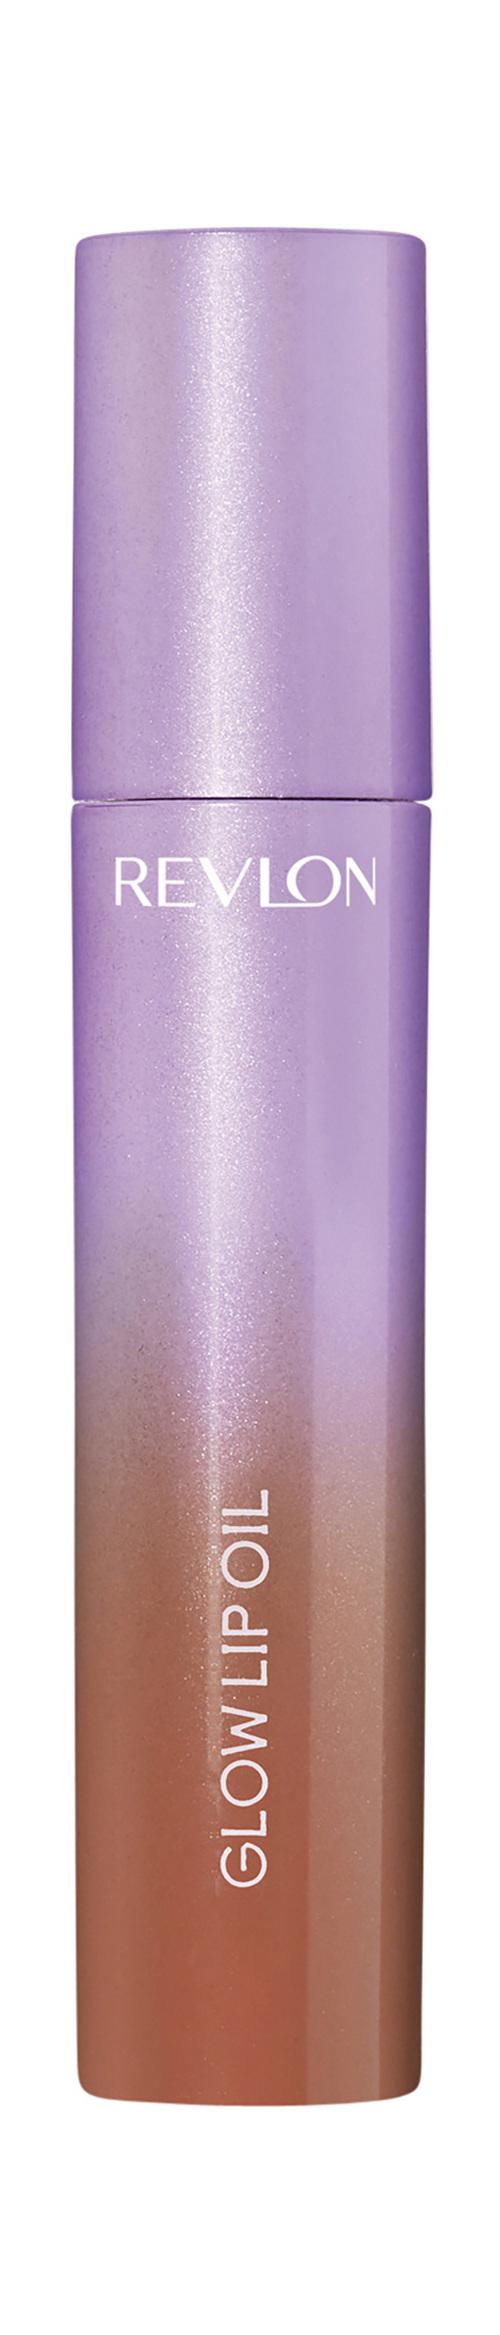 Crystal Aura Glow Lip Oil Pretty Wicked